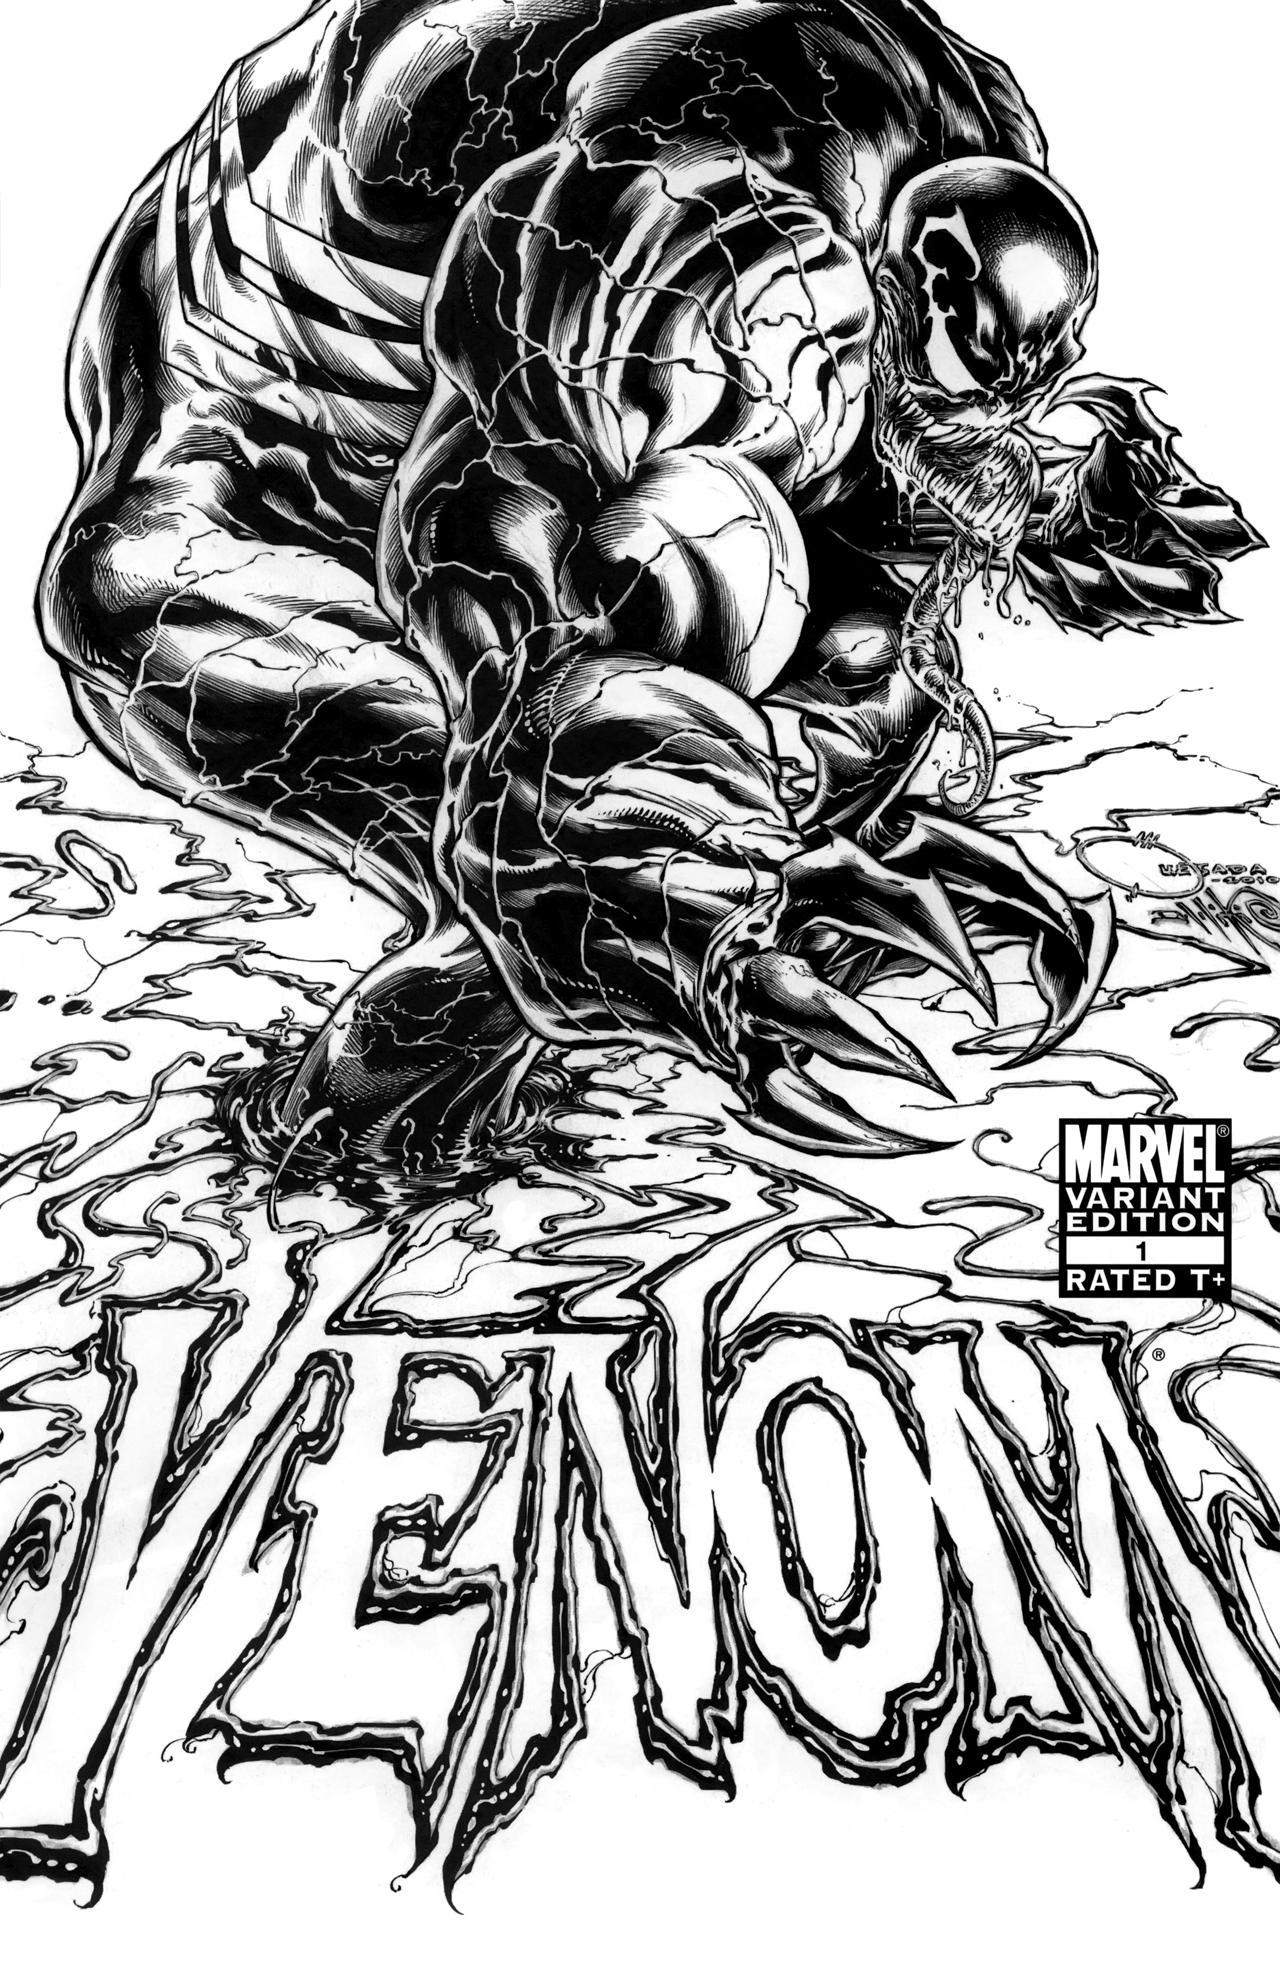 Venom Vol 2 1 Variant Sketch.jpg